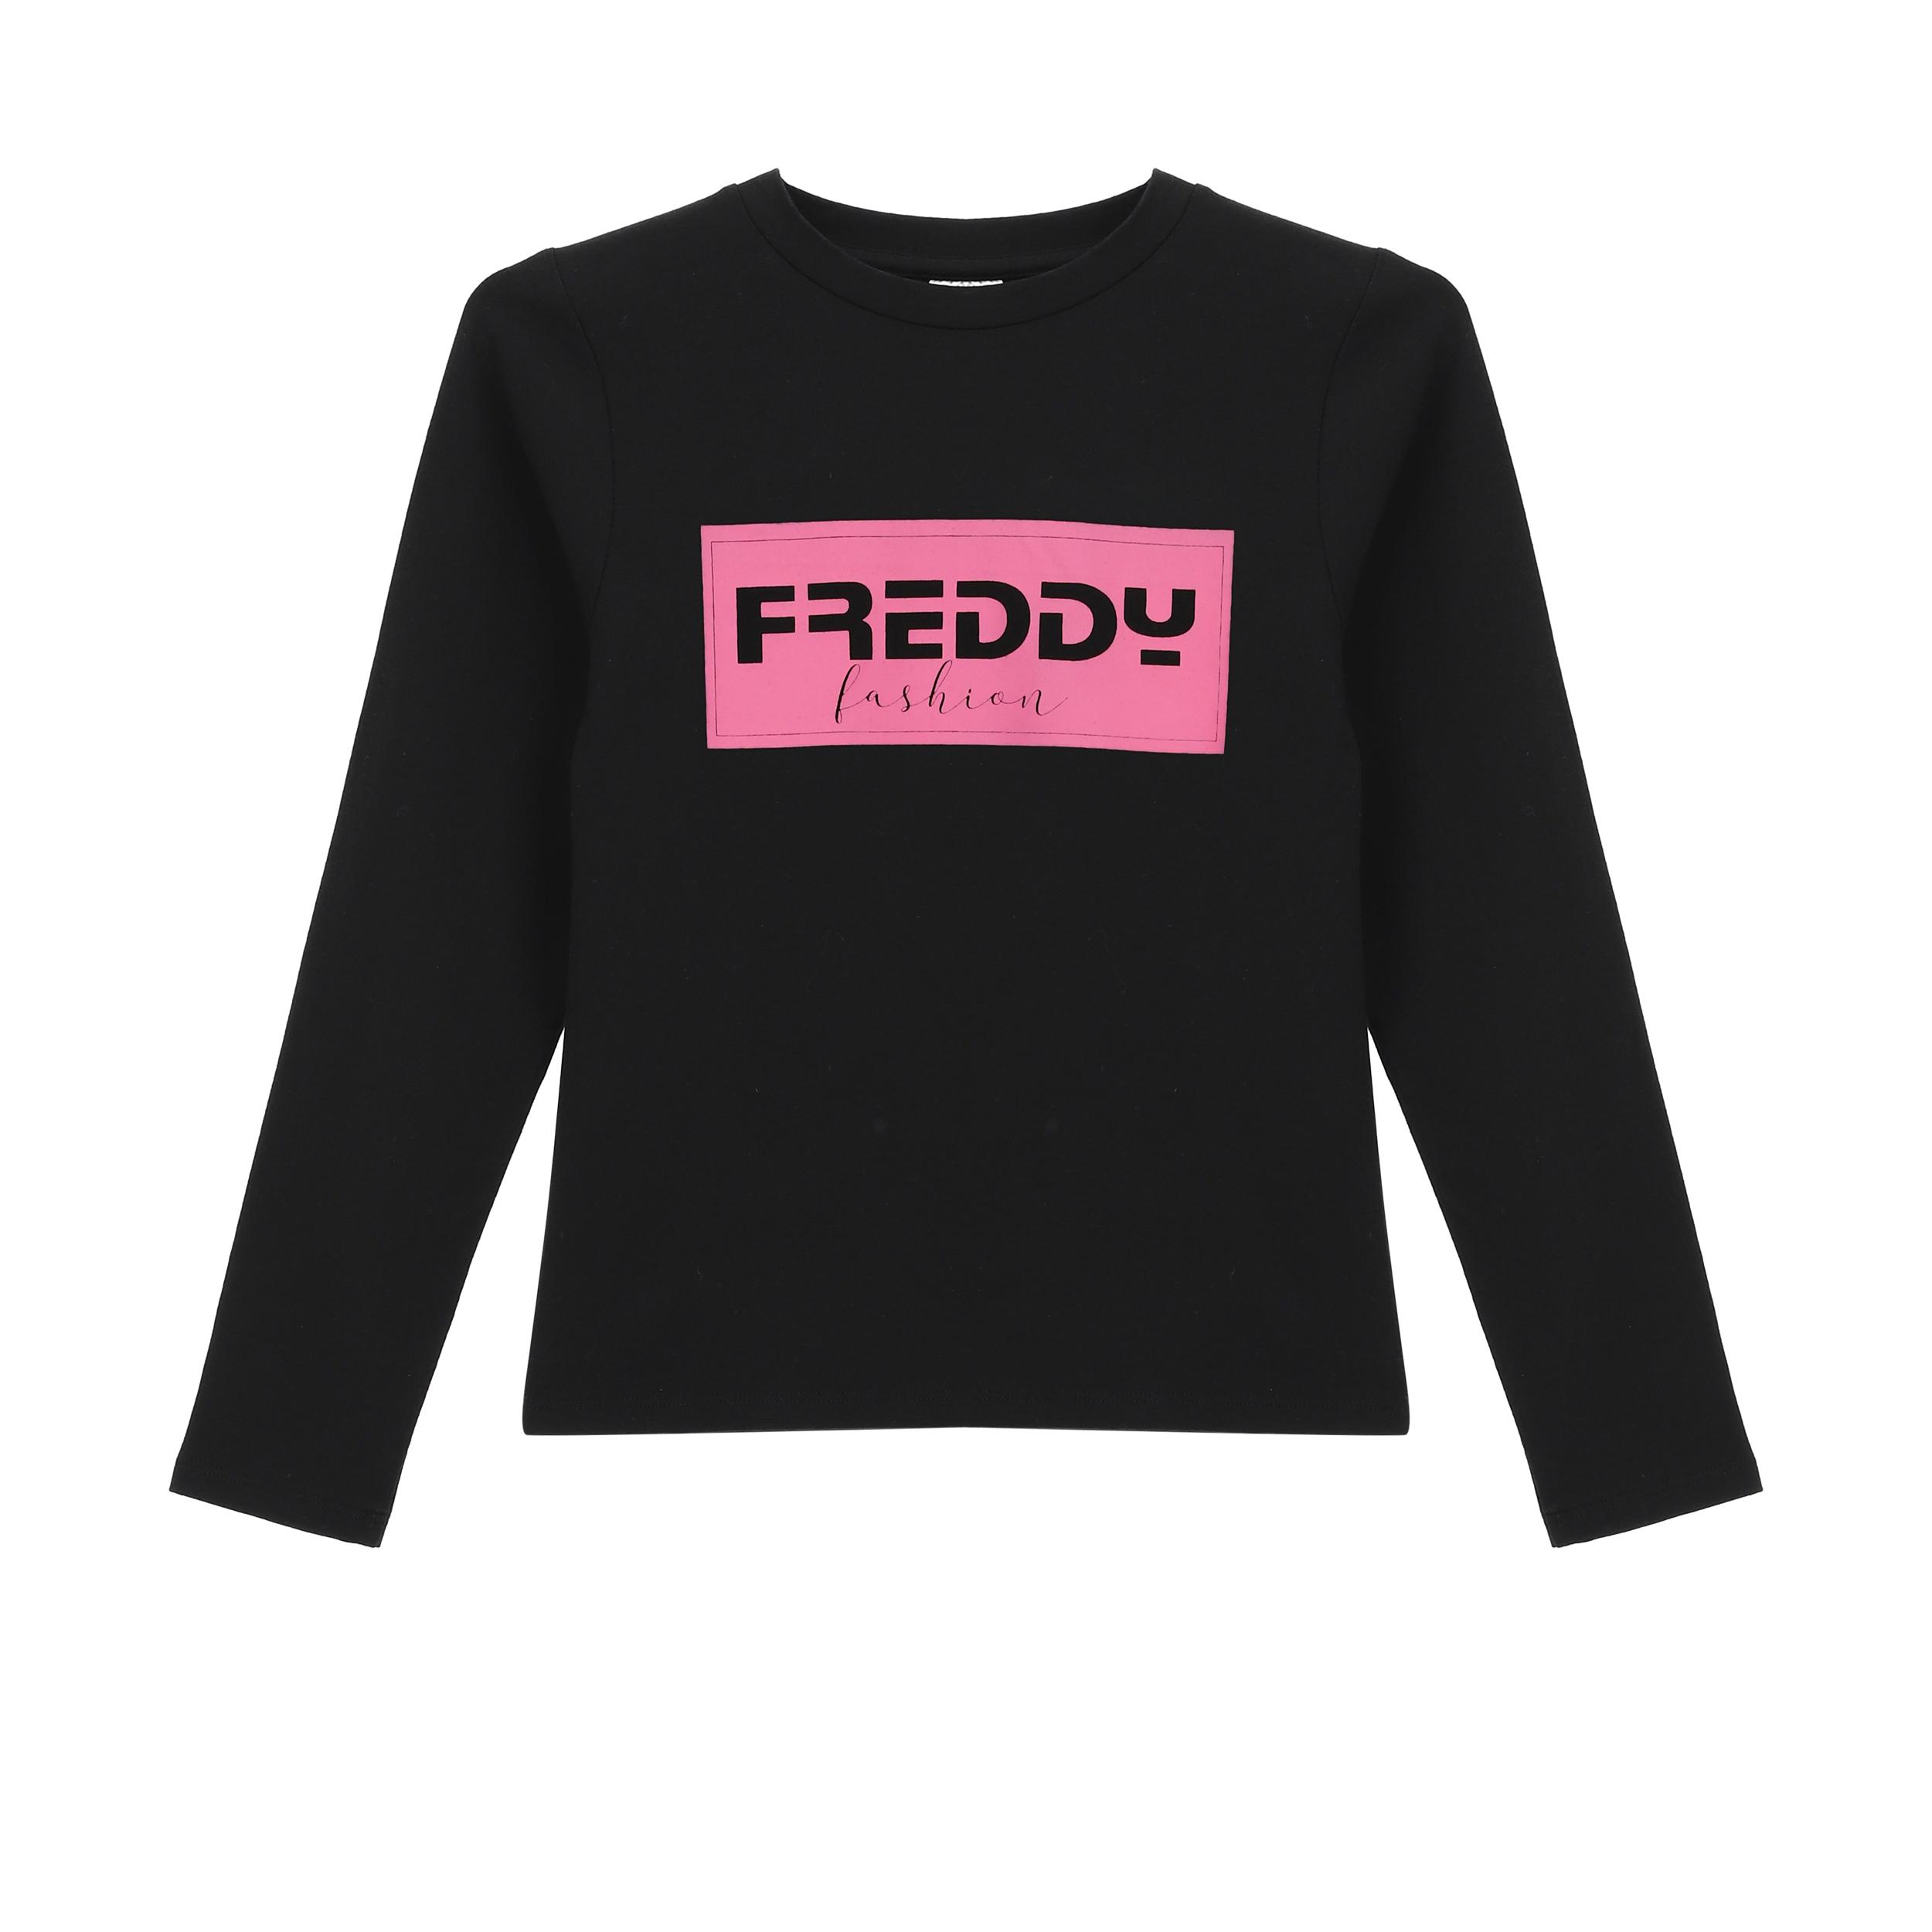 T-shirt manica lunga con stampa fucsia Freddy Fashion